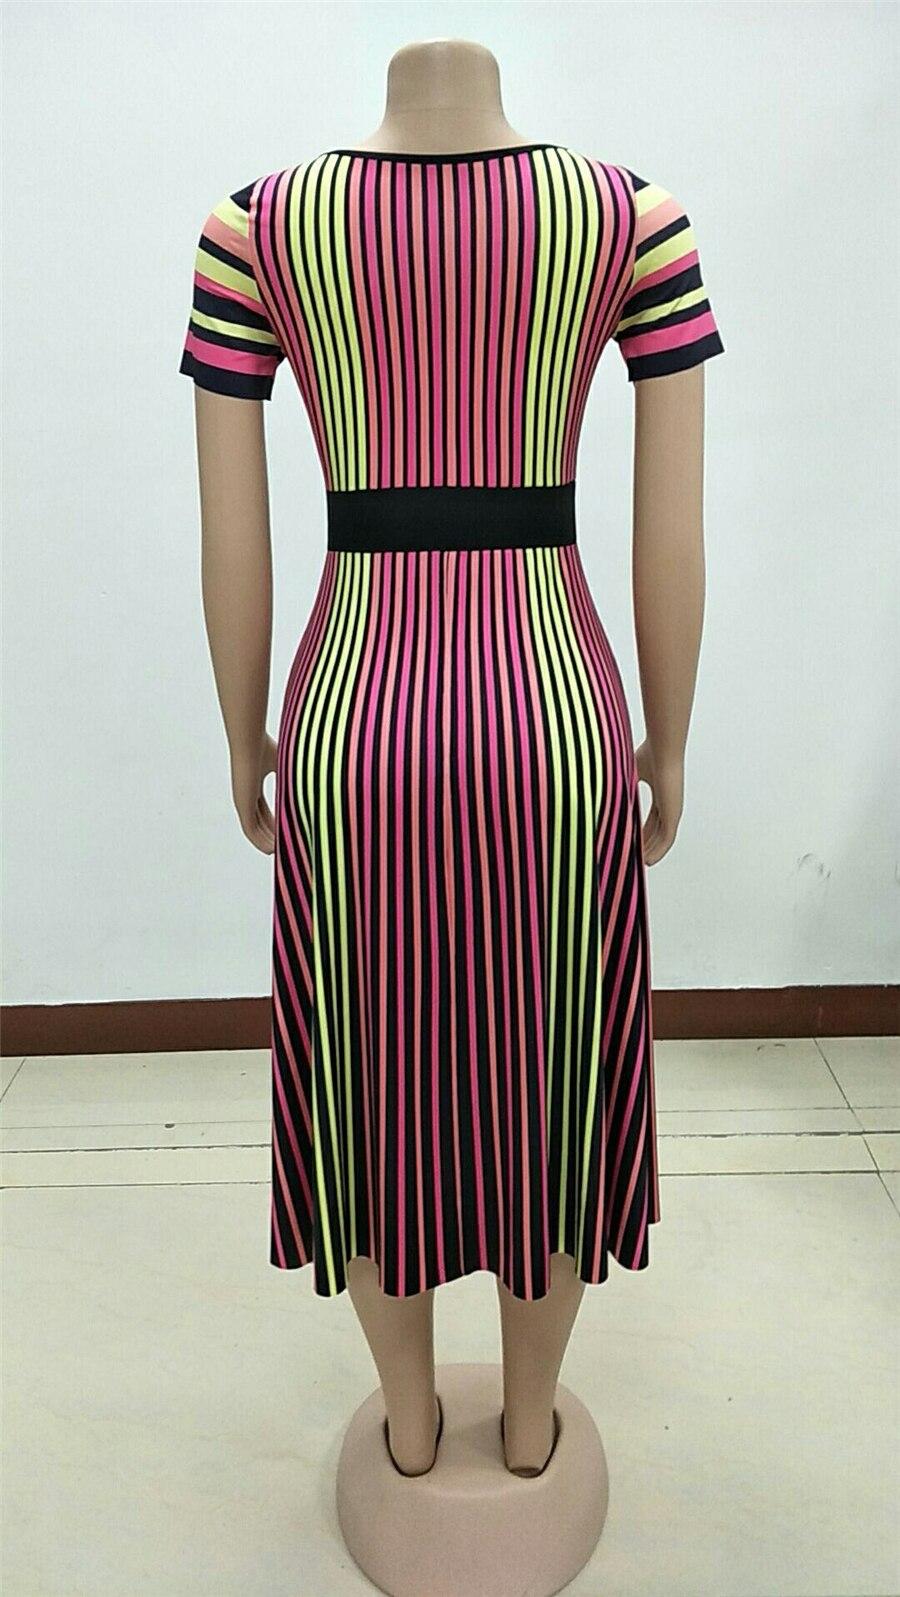 GuyuEra African Dresses For Women European Women's Dress Round Neck Lace Short-sleeved Mesh Lace Waist A Word Skirt (4)